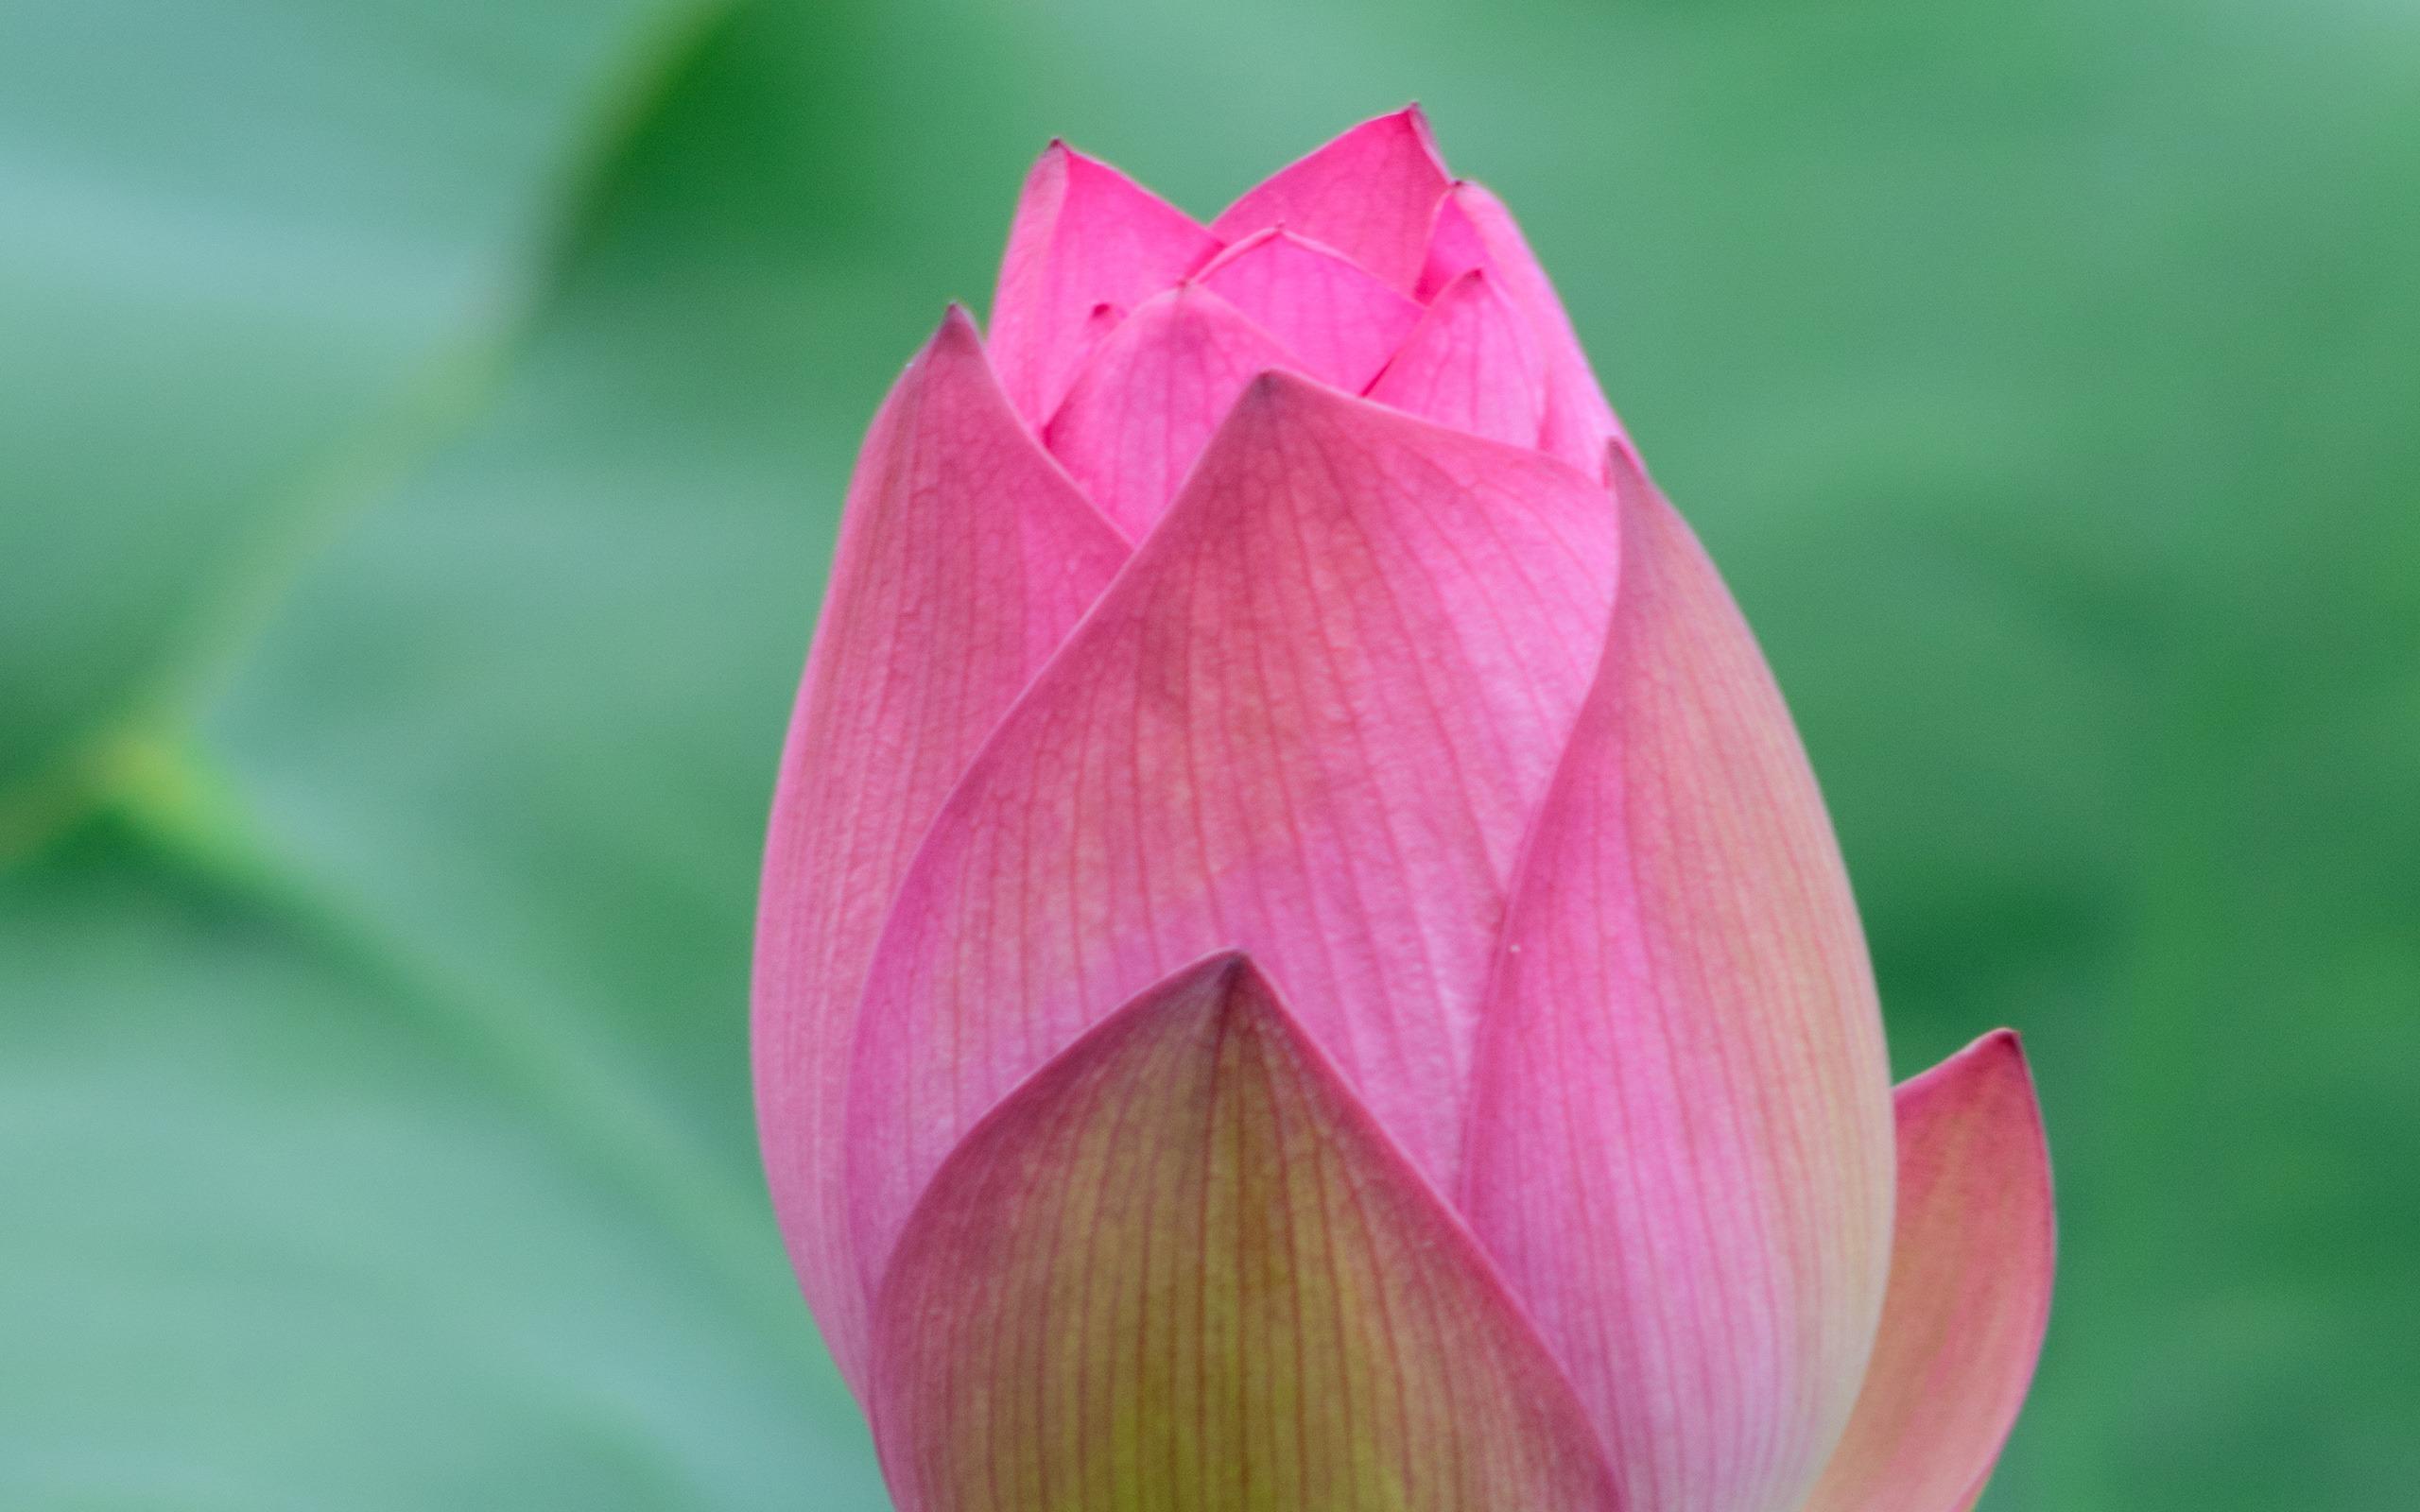 Summer Blooming Pink Lotus Flower Hd Wallpaper Preview 10wallpapercom